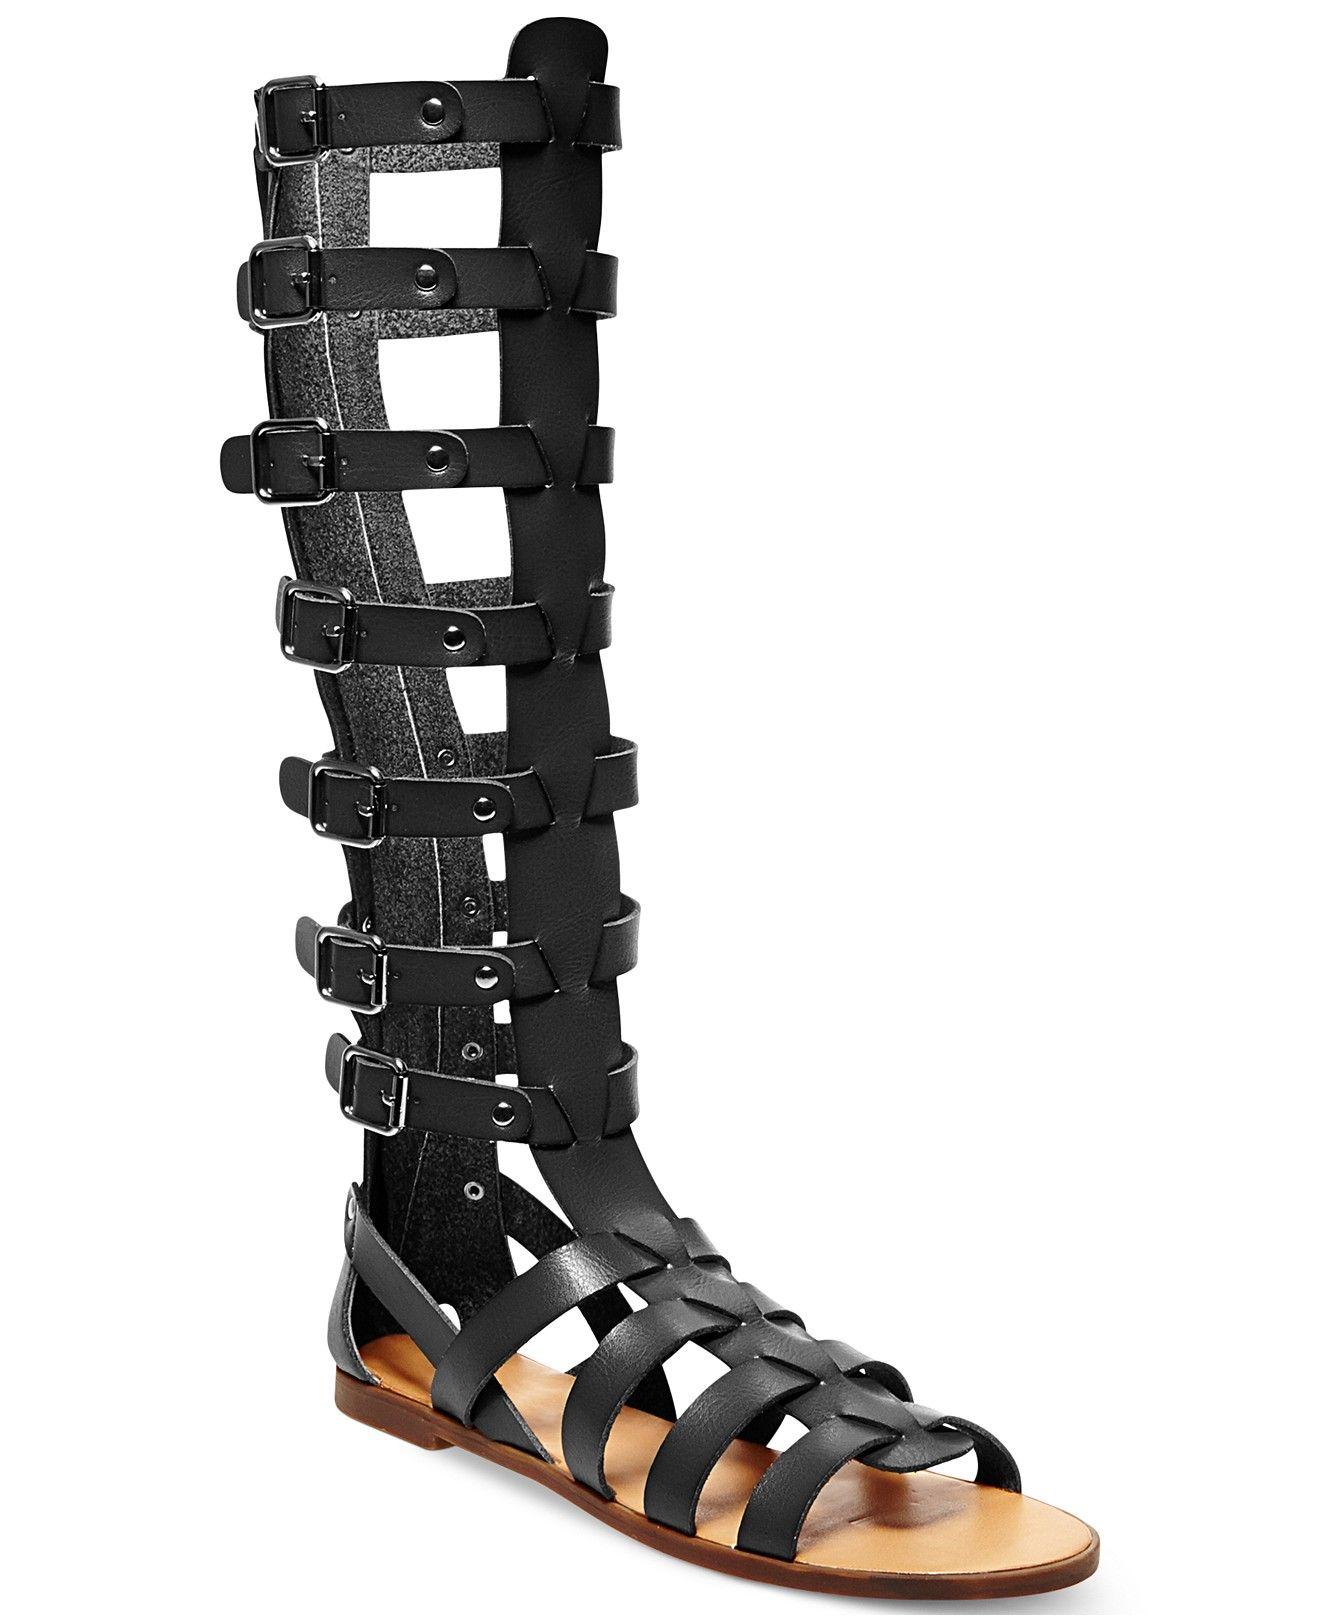 4221f2eb972 Madden Girl Penna Tall Shaft Gladiator Sandals - Juniors - Macy's ...